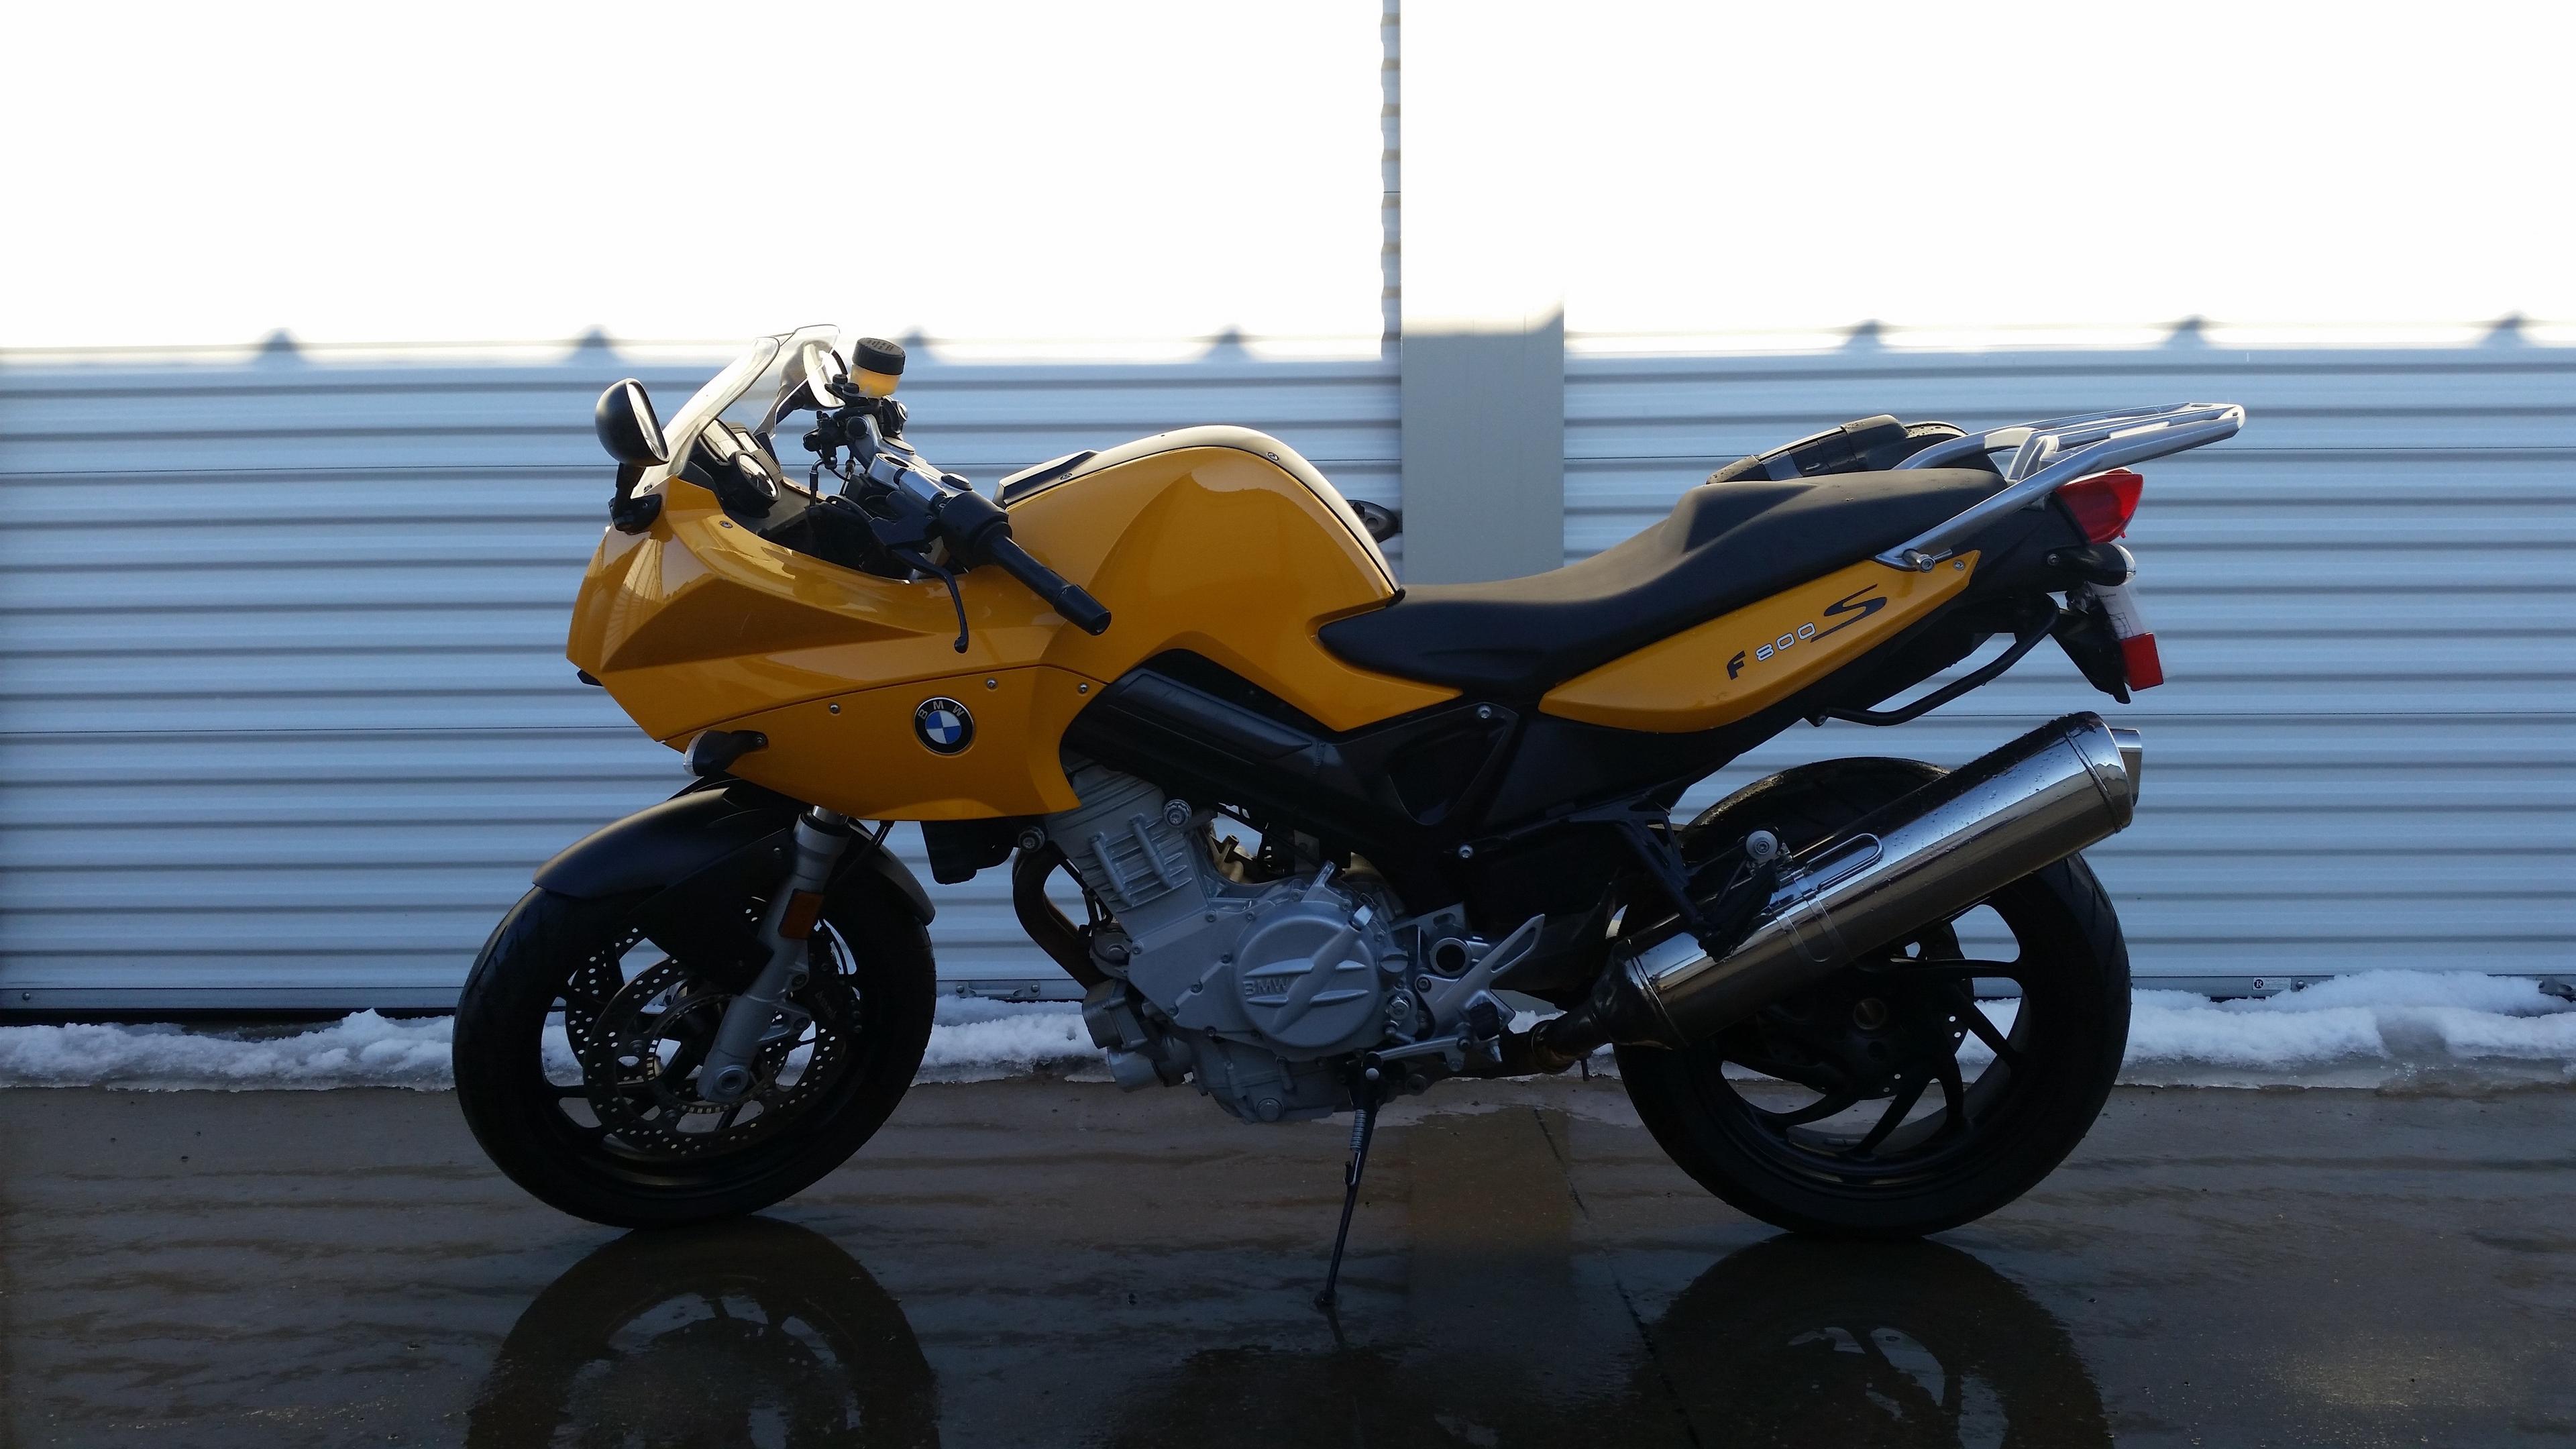 bmw motorcycle sportbike 4k 1536018882 - bmw, motorcycle, sportbike 4k - Sportbike, Motorcycle, bmw